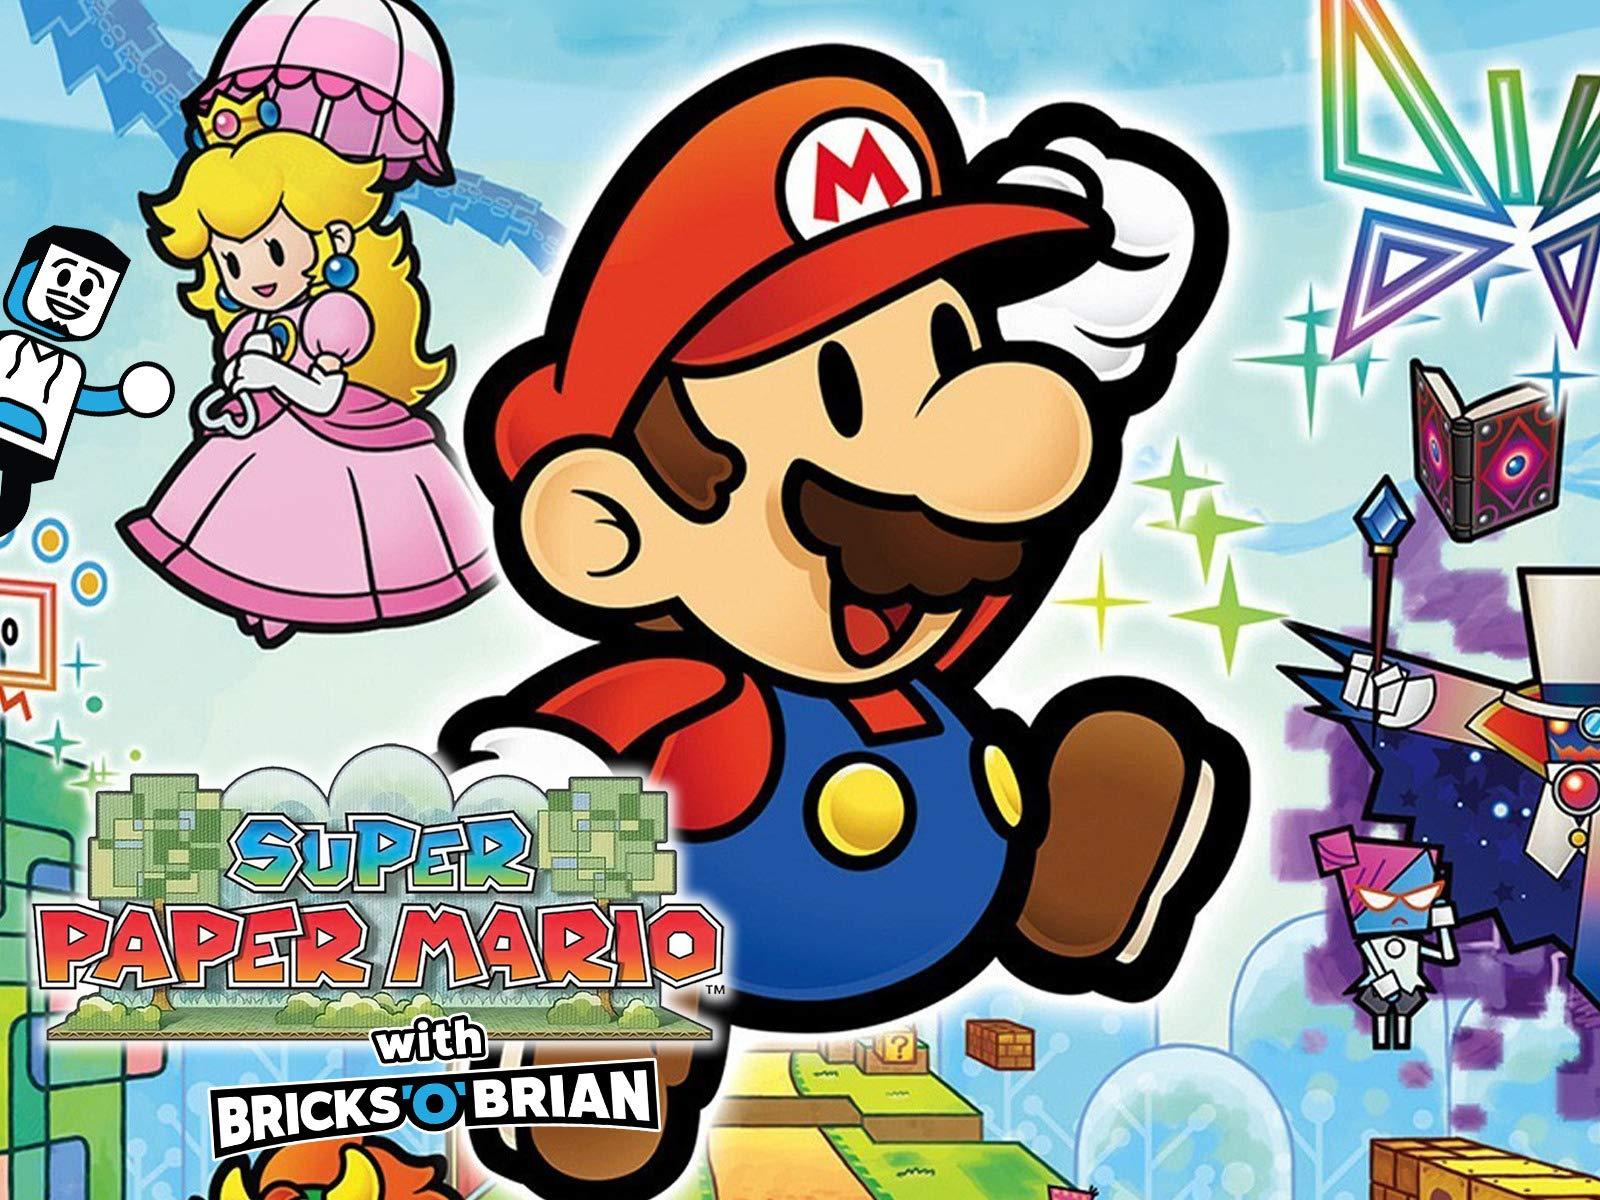 Clip: Super Paper Mario with Bricks 'O' Brian! - Season 1